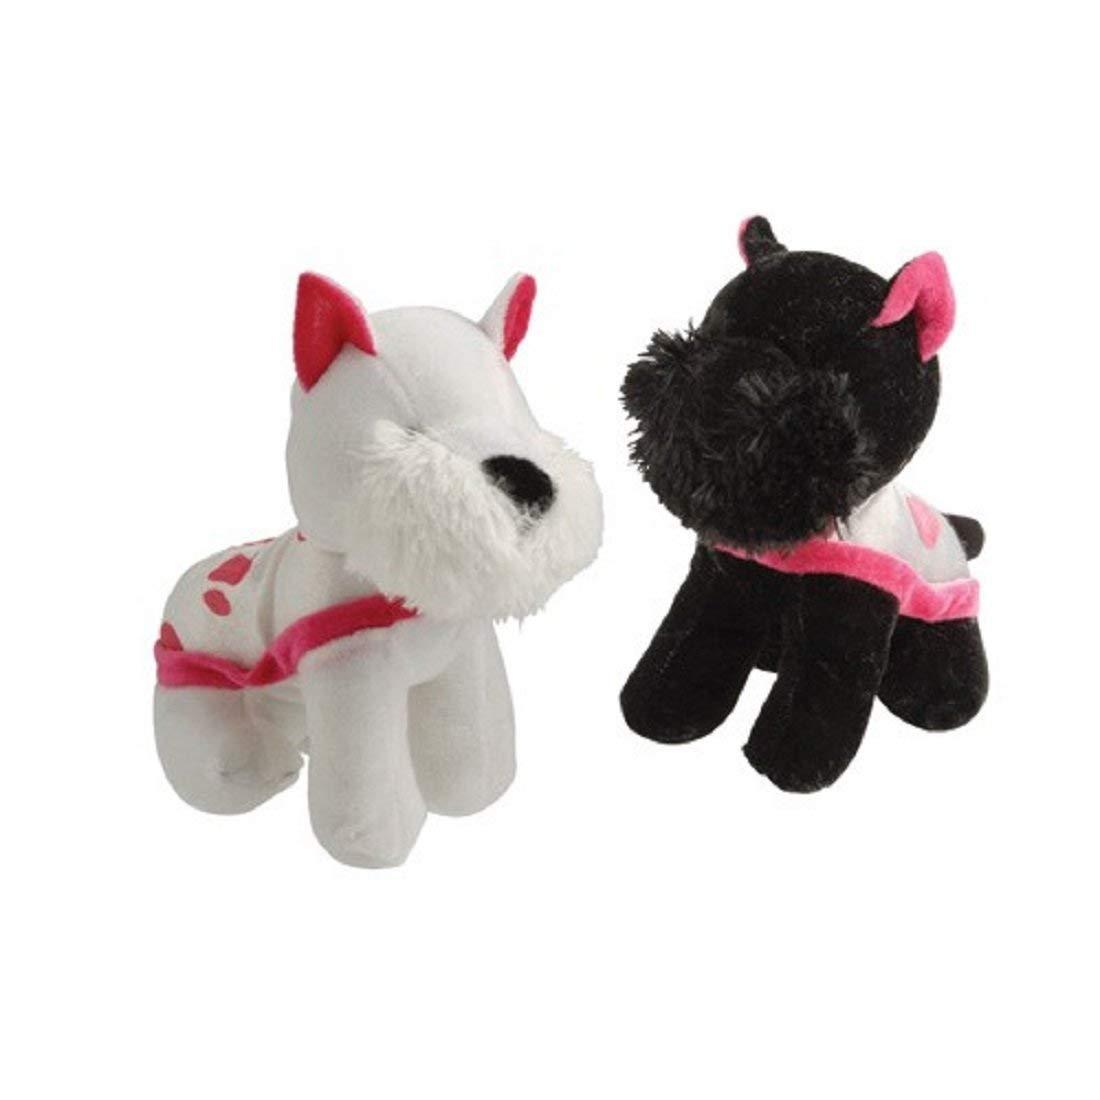 Dozen Assorted Standing Stuffed Plush Scottish Terrier Scottie Dogs With Coats Animal Toys